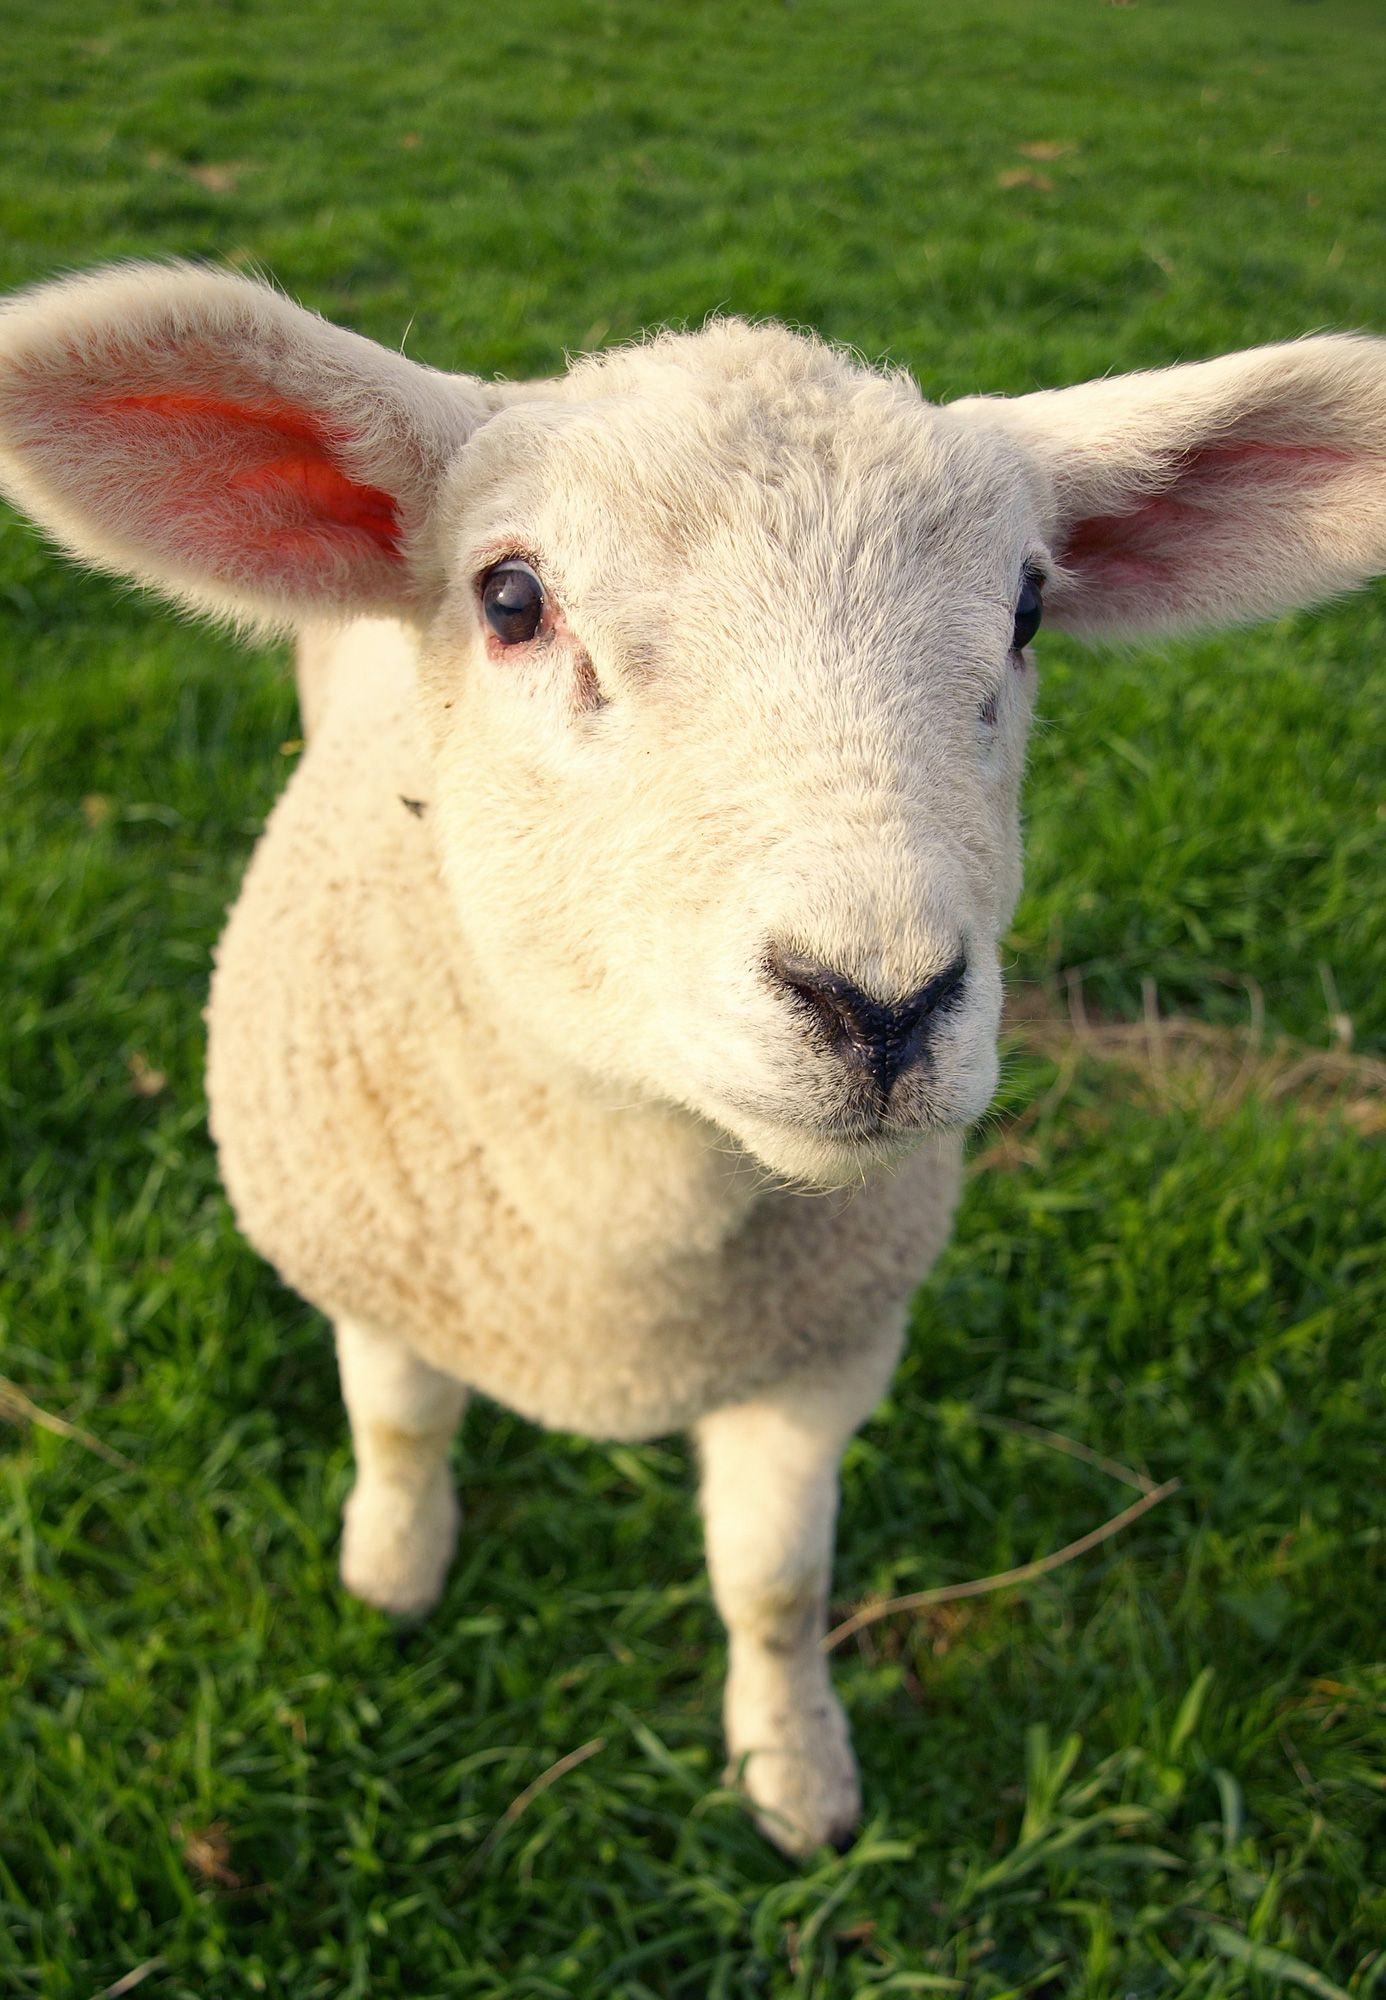 animales granja - oveja